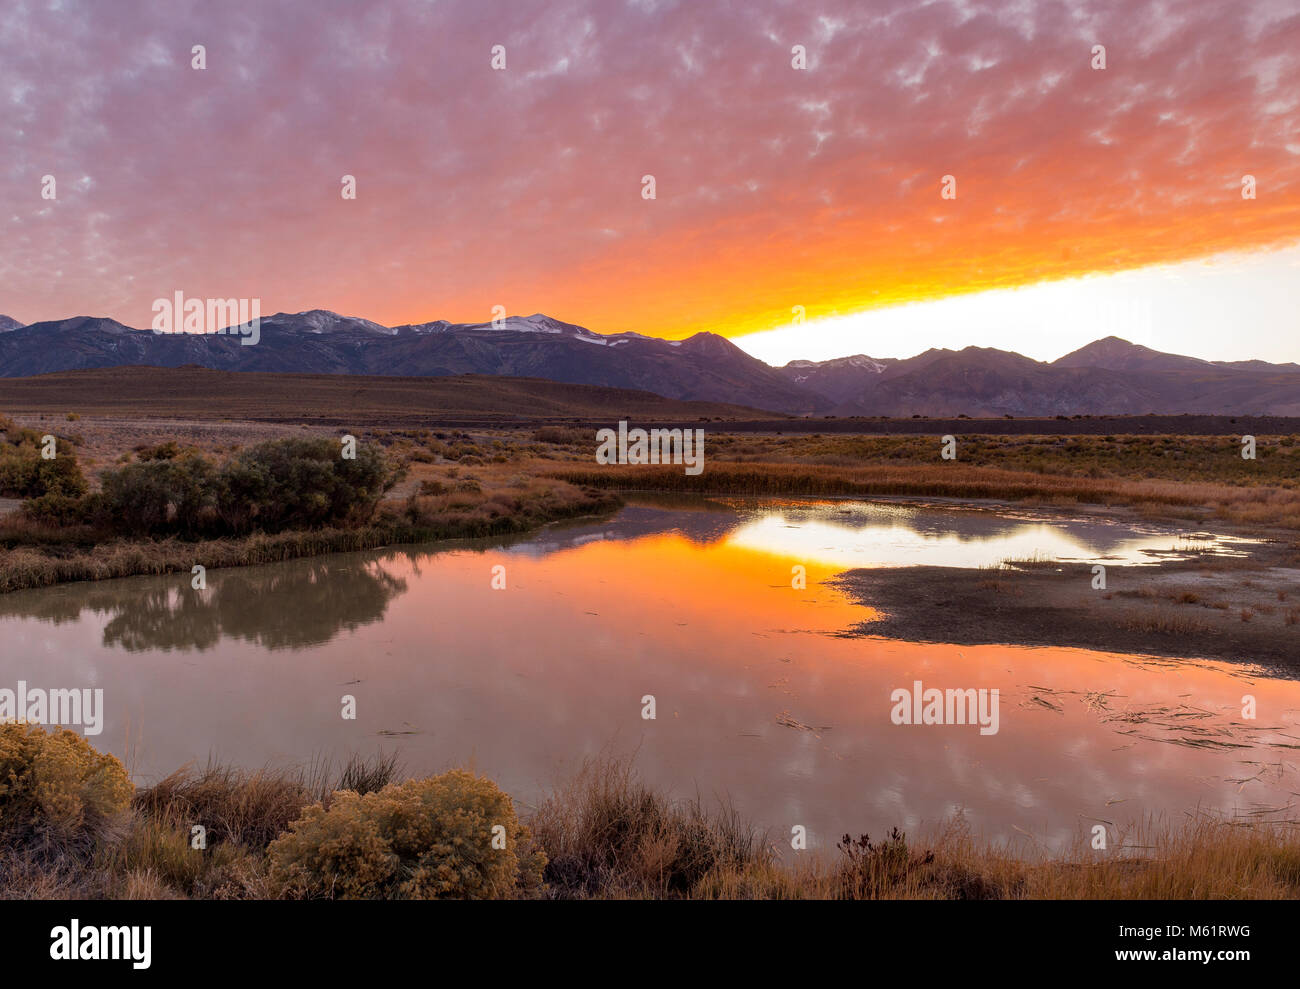 Sonnenuntergang, Feuchtgebiete, Mono Basin National Forest Scenic Area, östlichen Sierra, Inyo National Forest, Stockbild